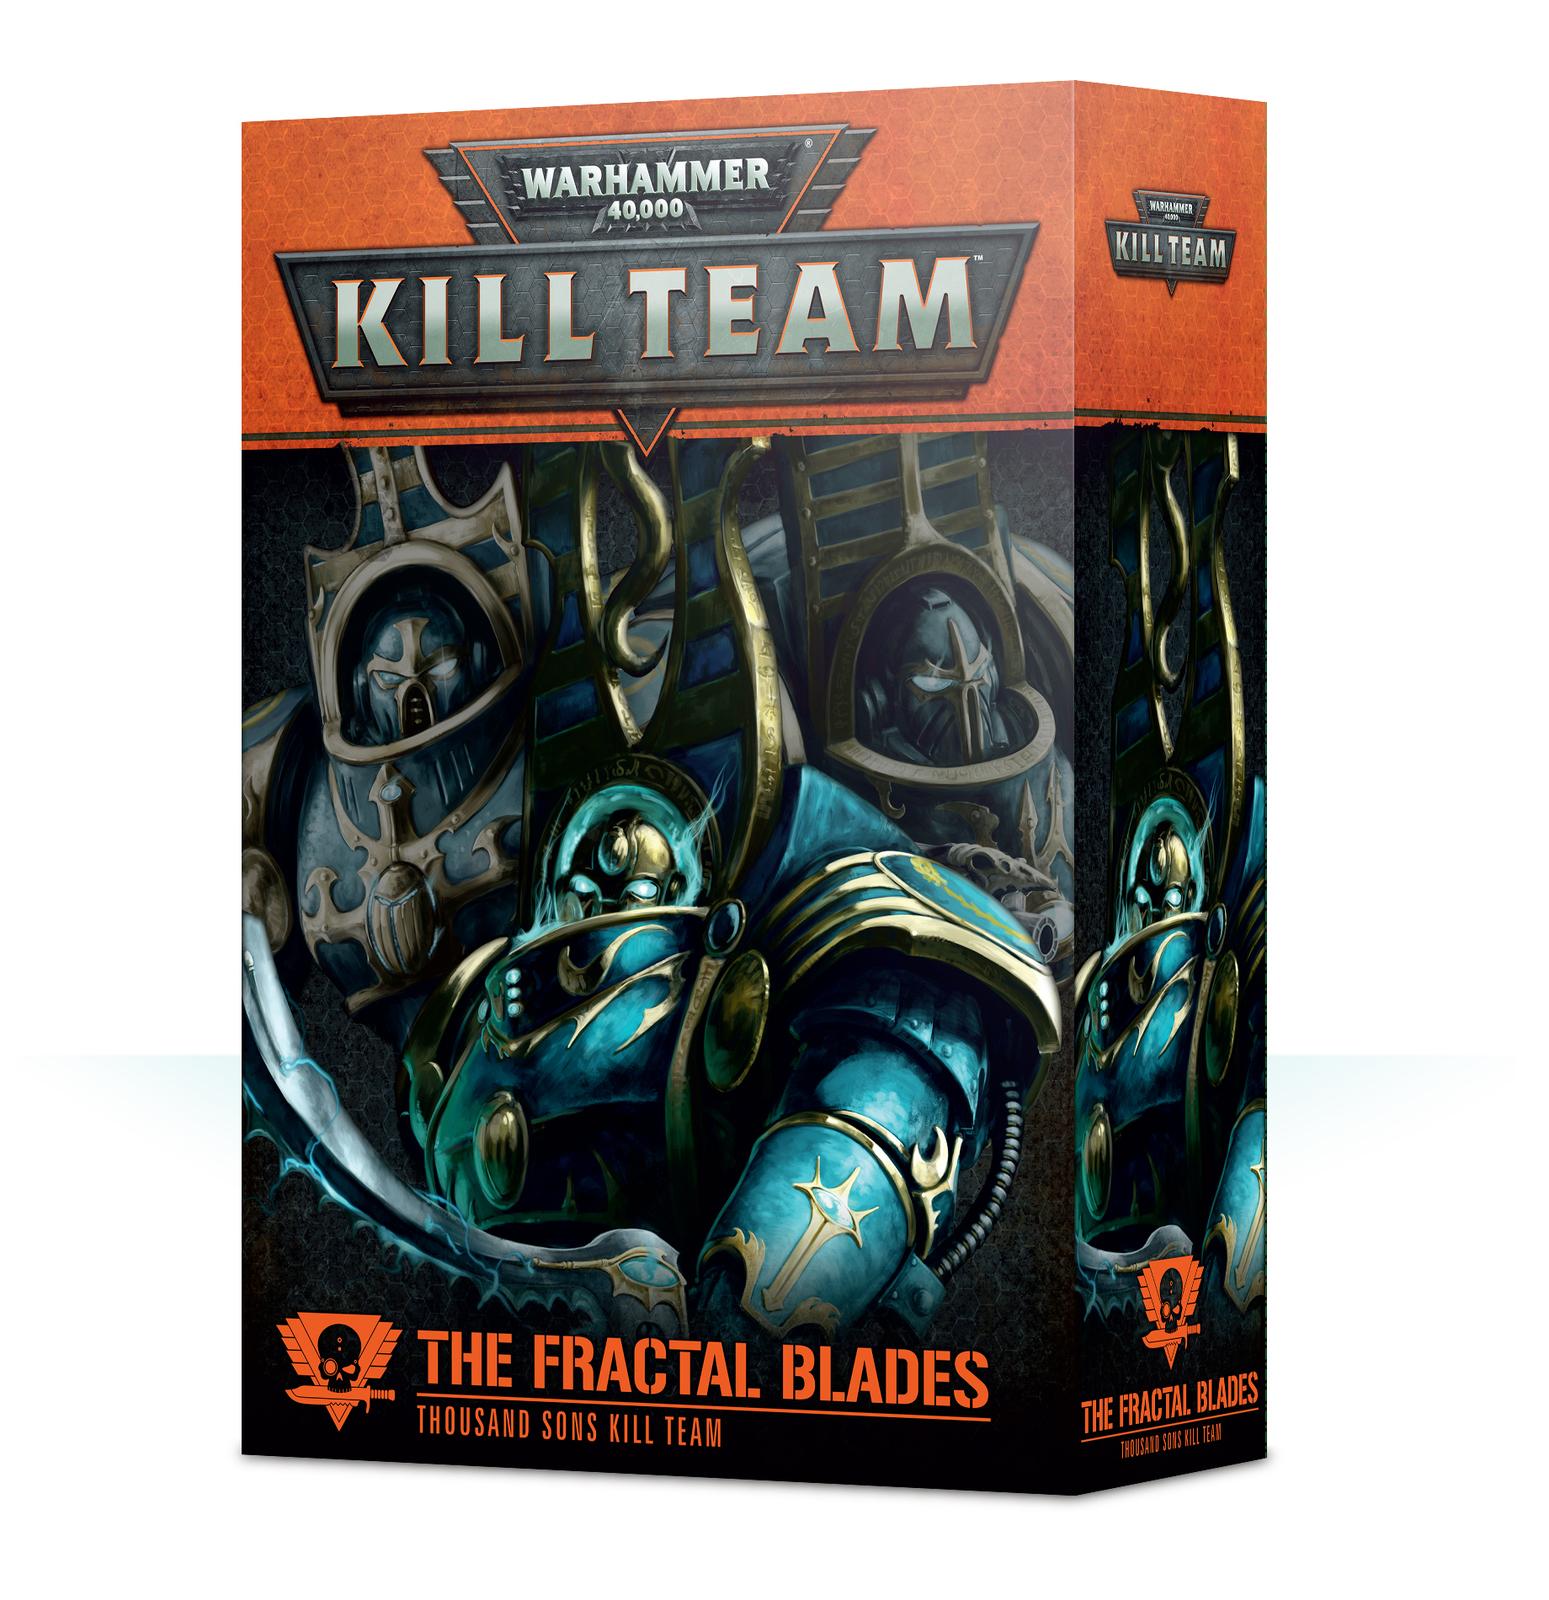 Warhammer 40,000: Kill Team - Fractal Blades image